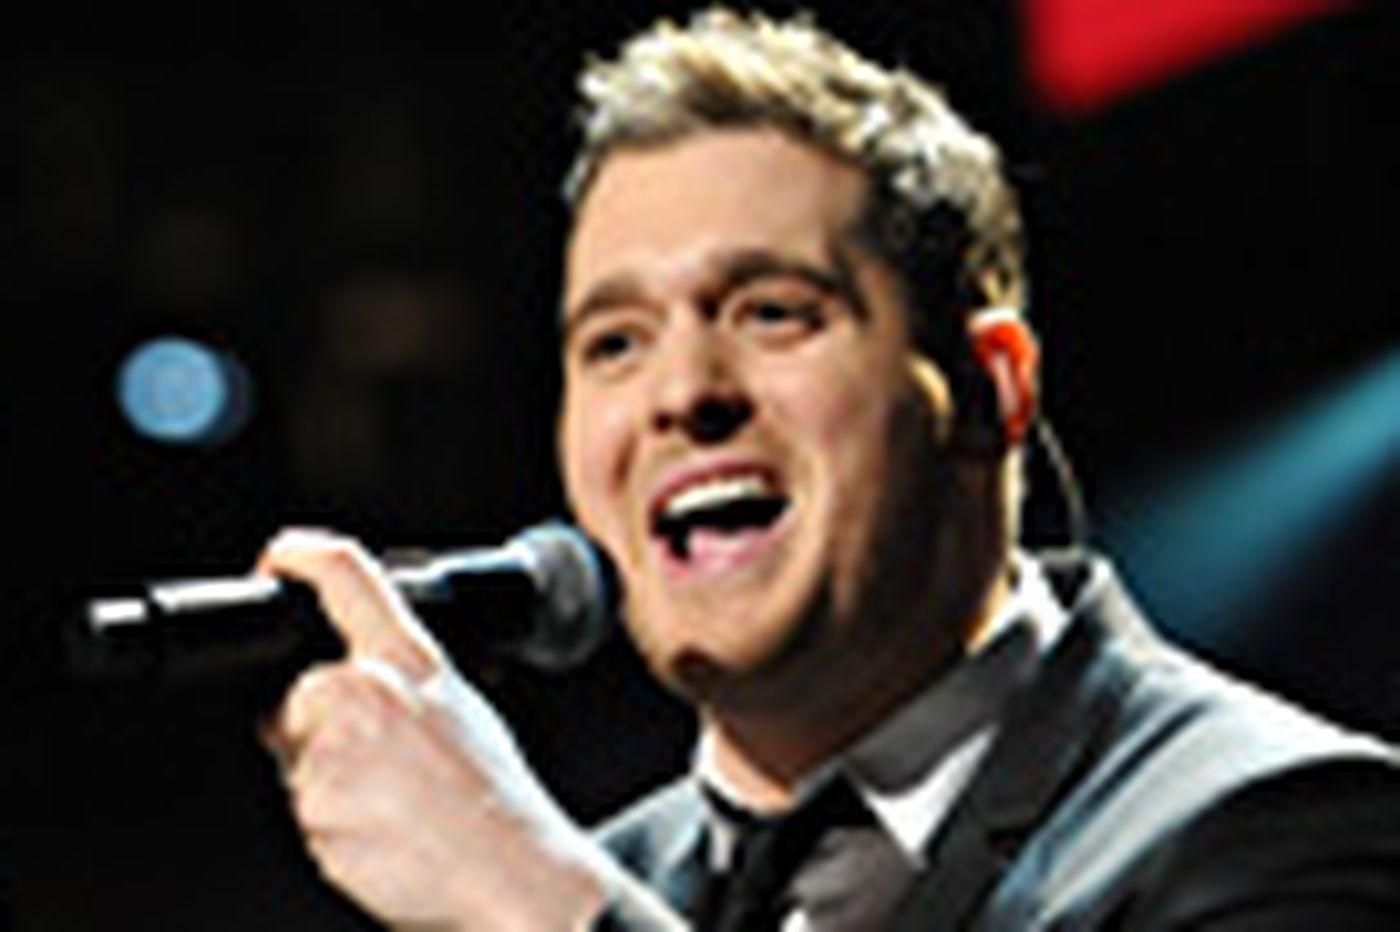 Michael Buble, 'Idol' stars, Matthew Morrison top summer lineup in Atlantic City